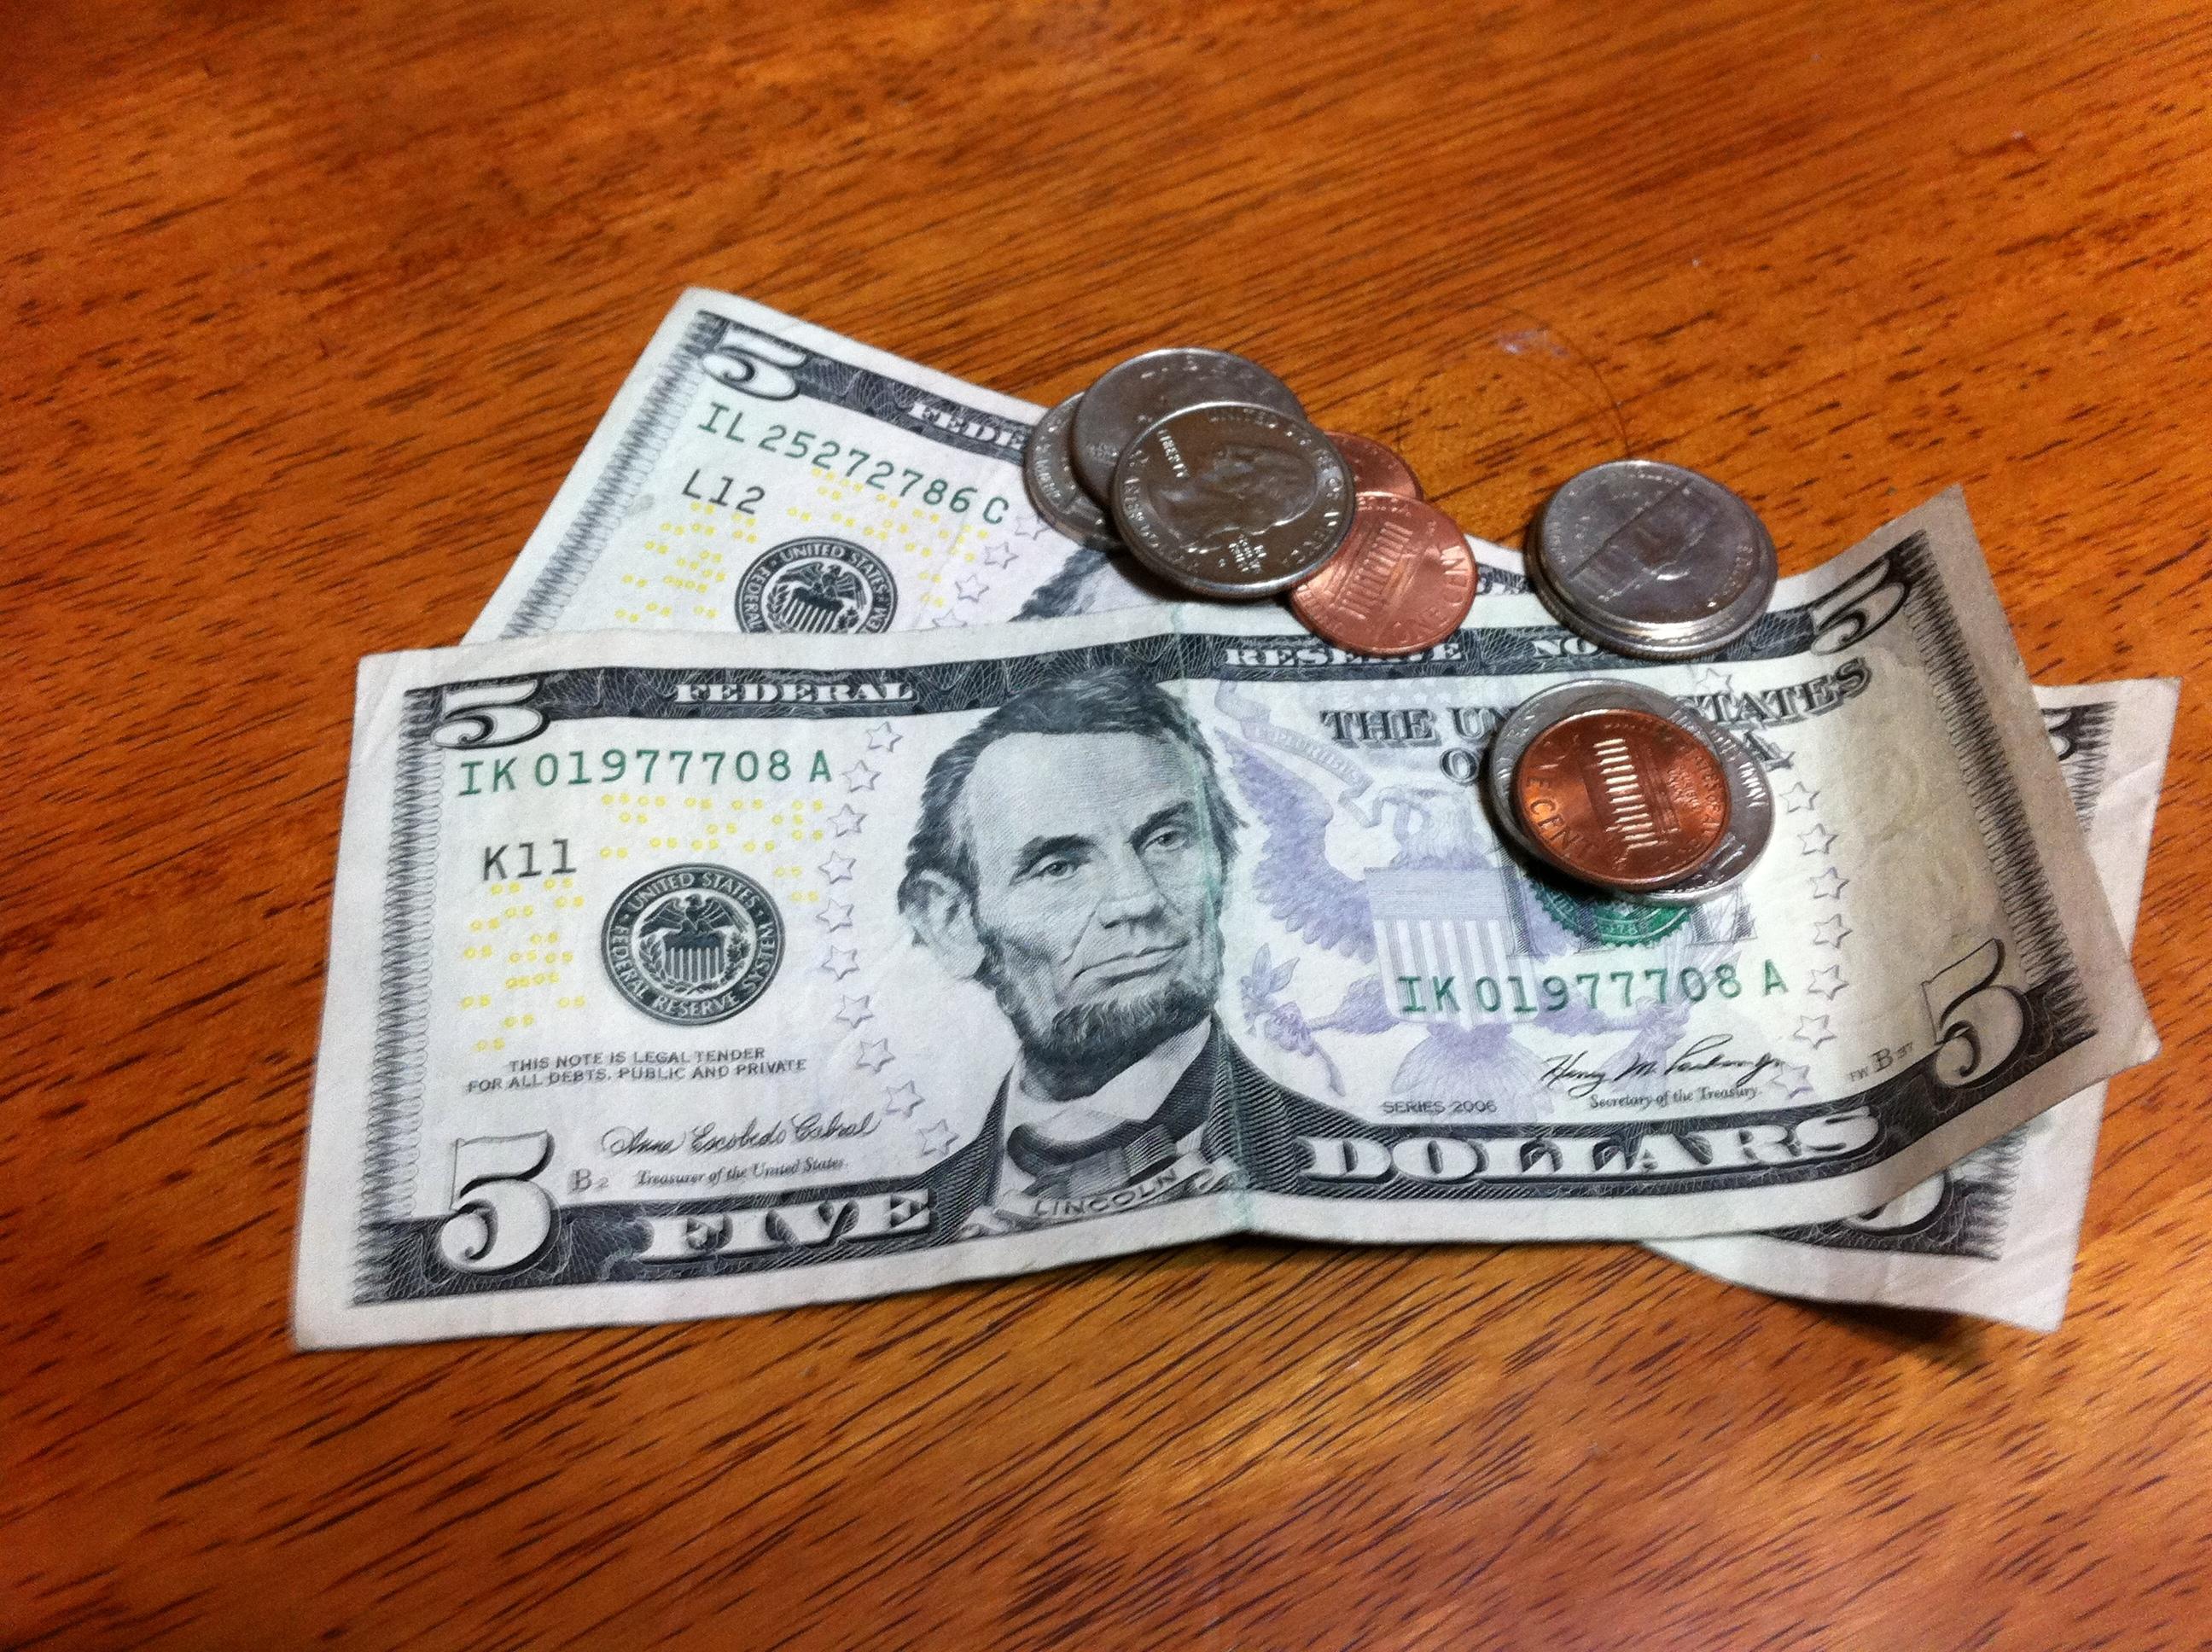 Gambar Kas Mata Uang Dolar Ds106 Plpconnectu